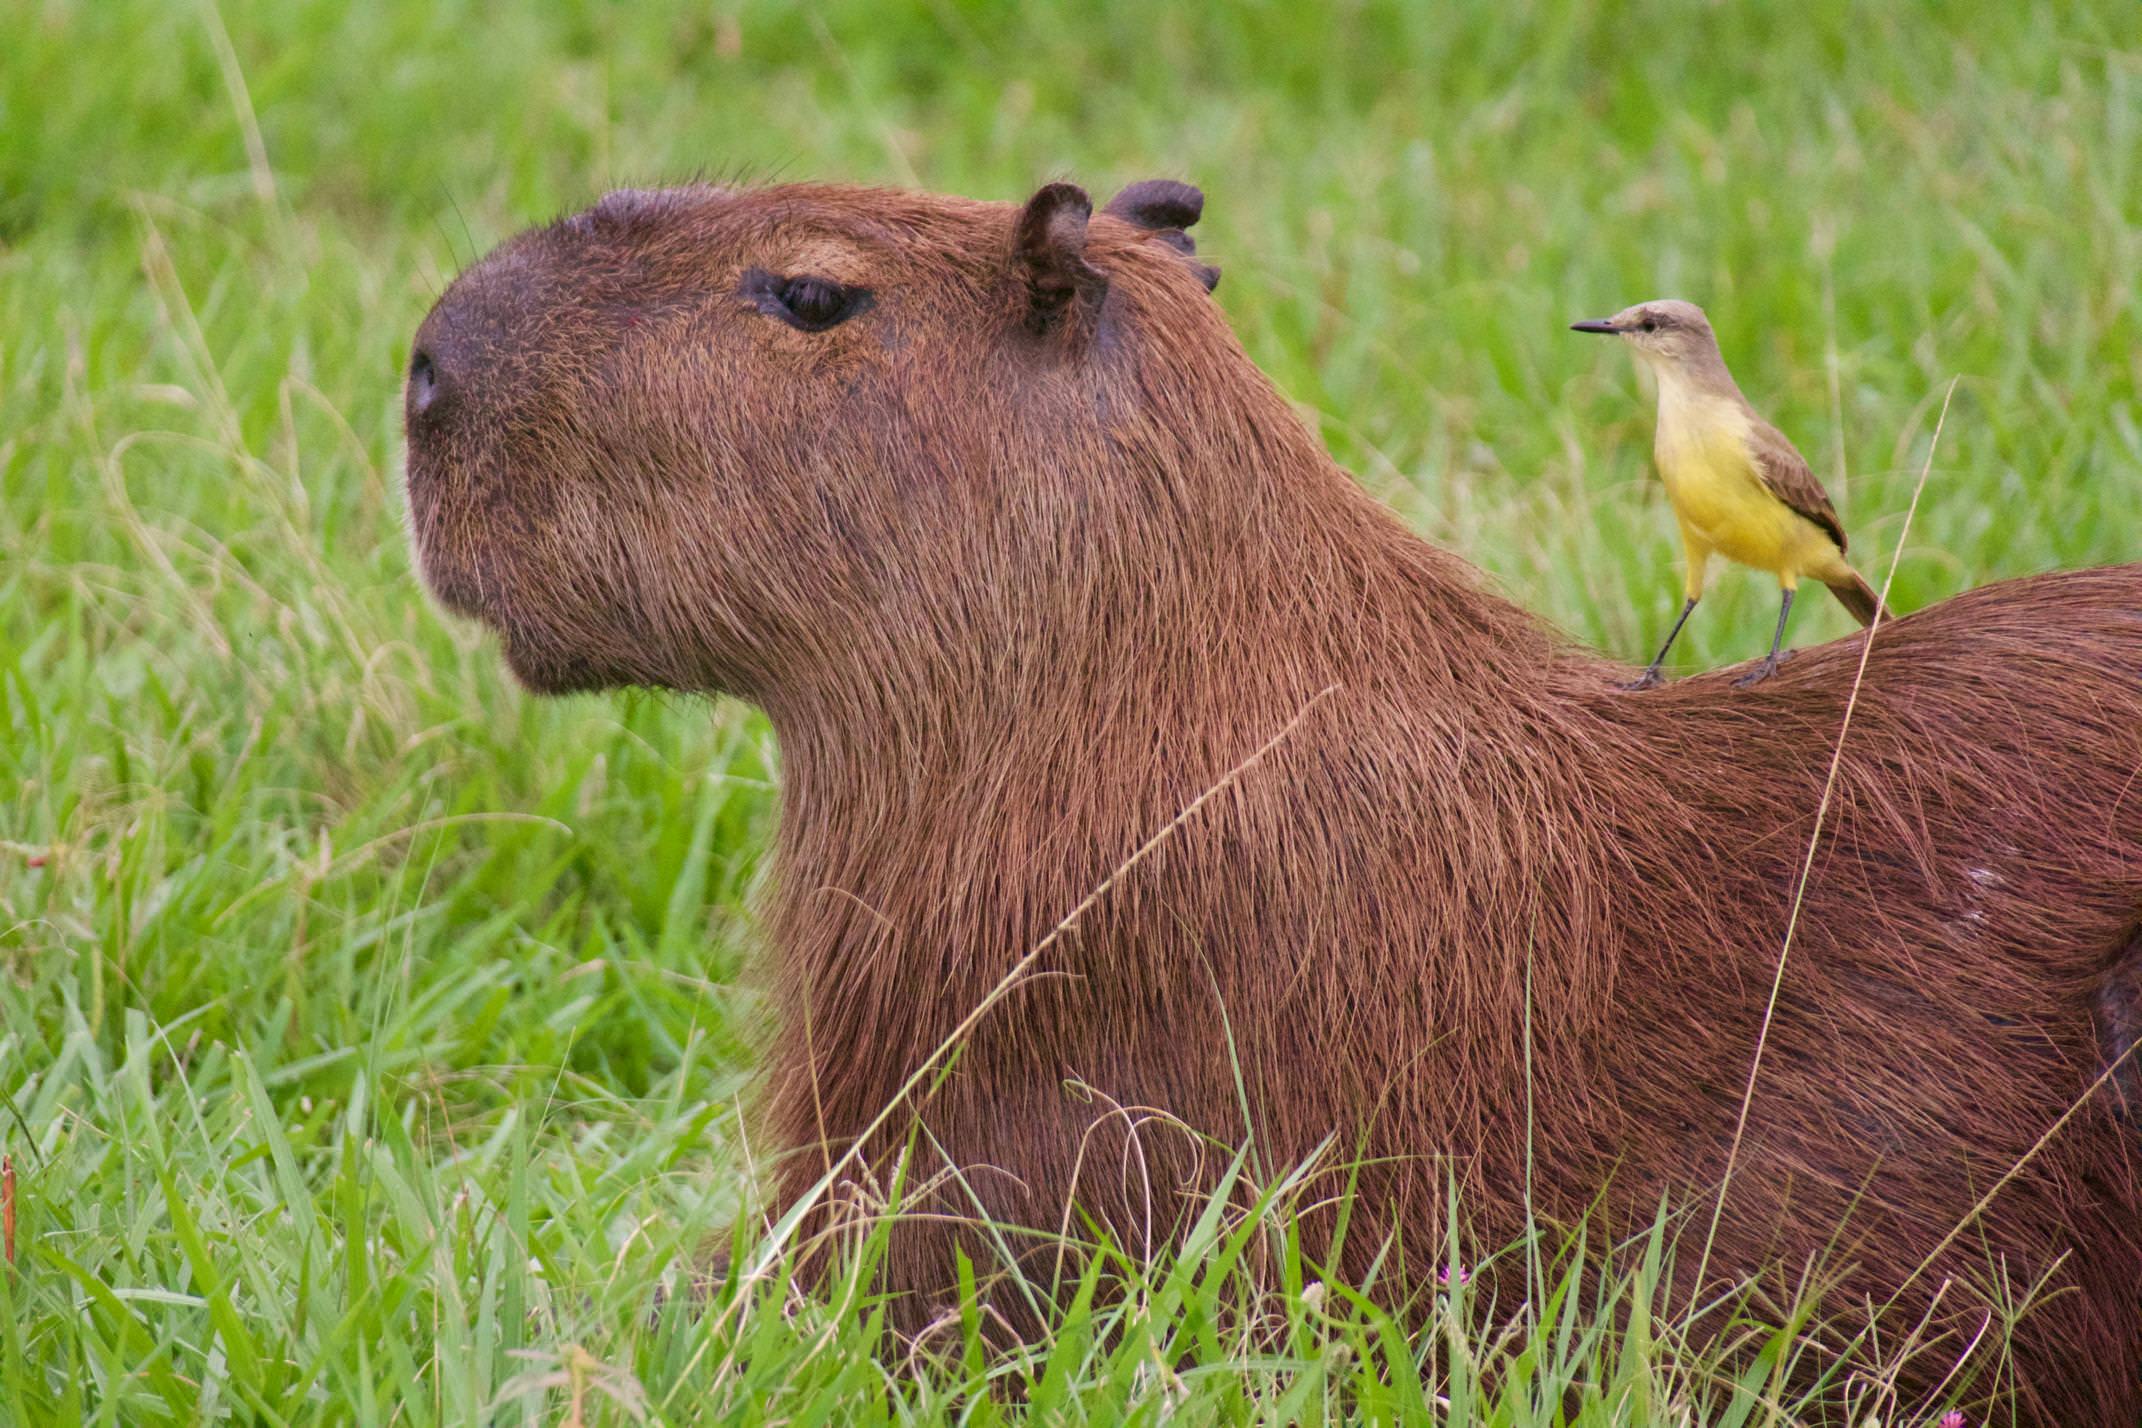 Brazil pantanal caiman lodge capybara wth cattle tyrant copyright thomas power pura aventura